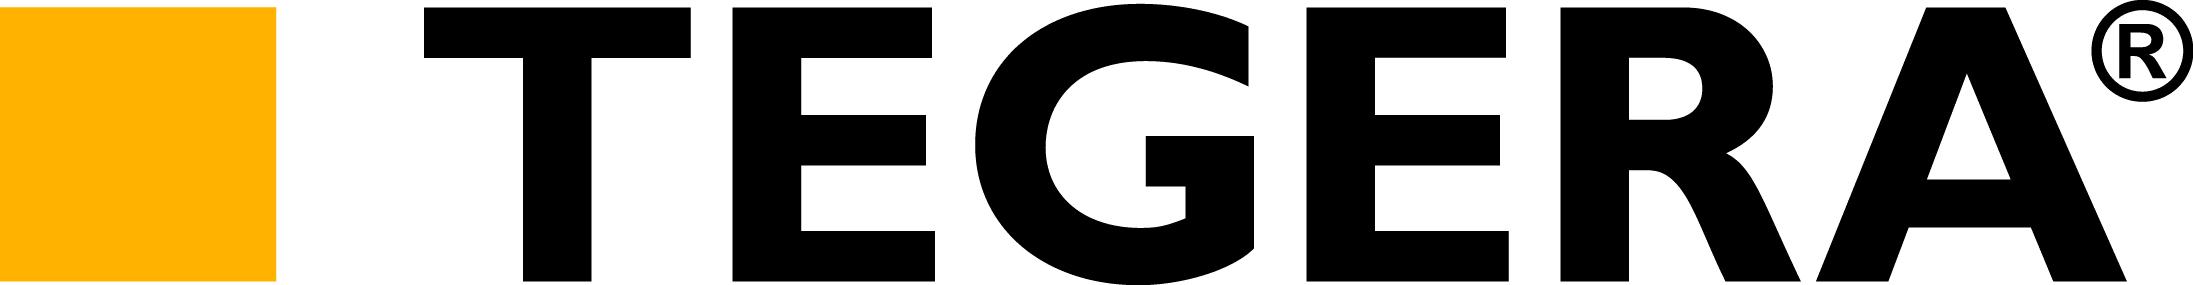 Tegera logo